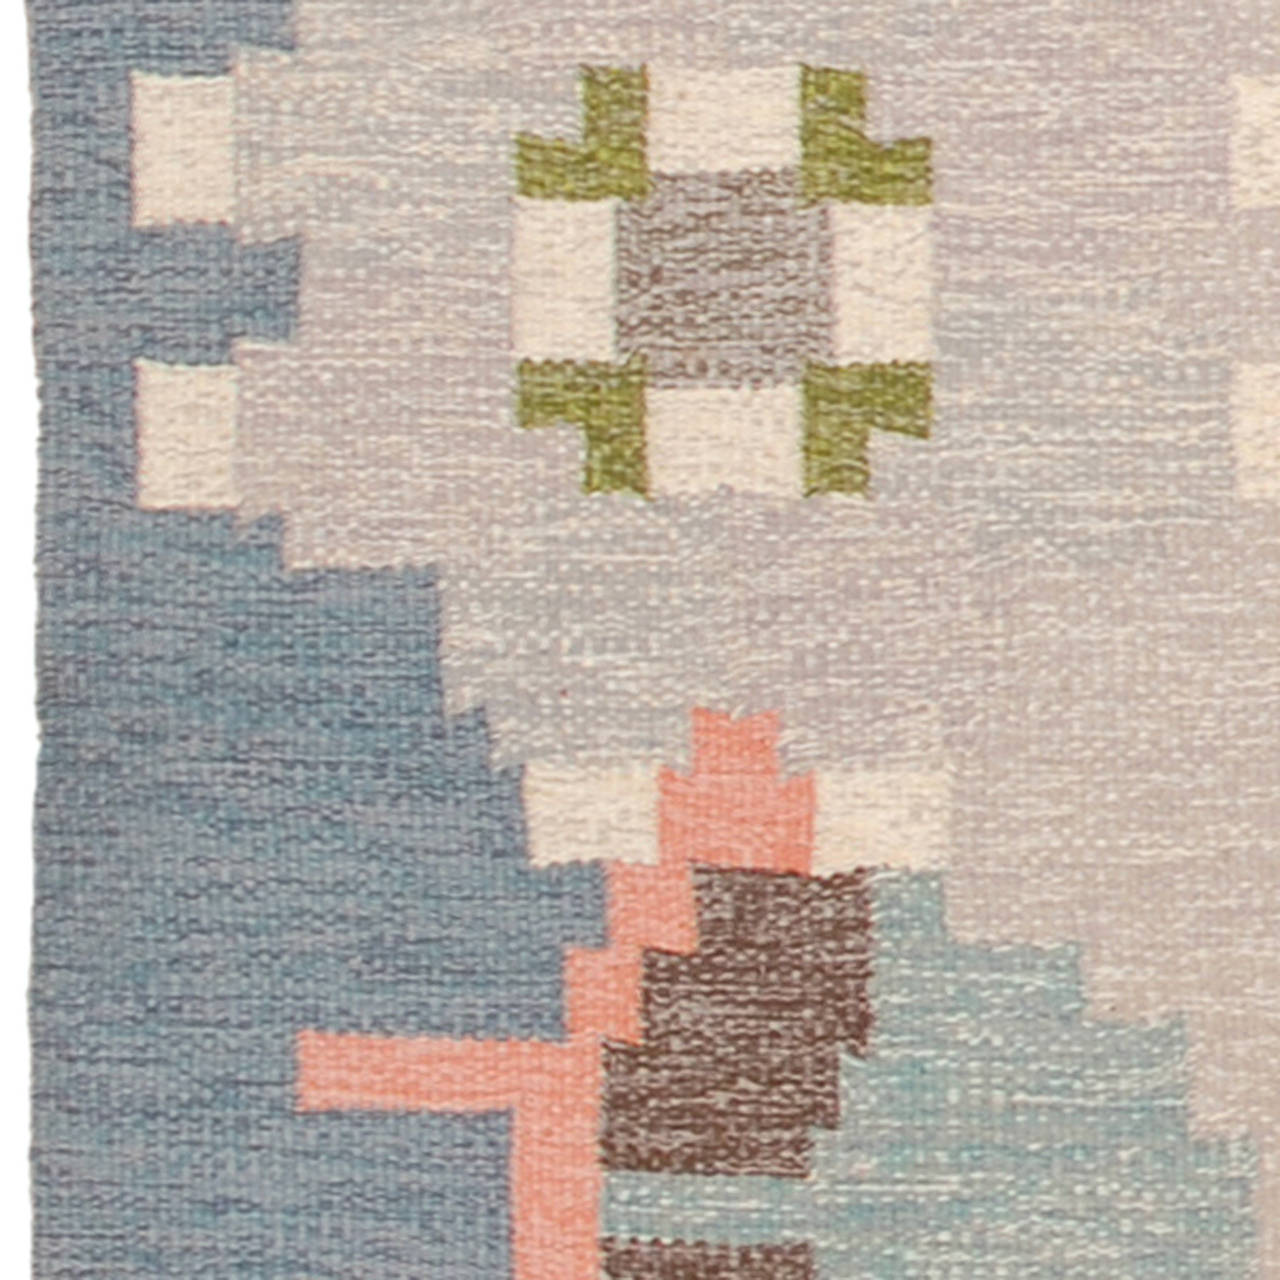 Hand-Woven 20th Century Swedish Flat-Weave Carpet by Ingegerd Silow For Sale